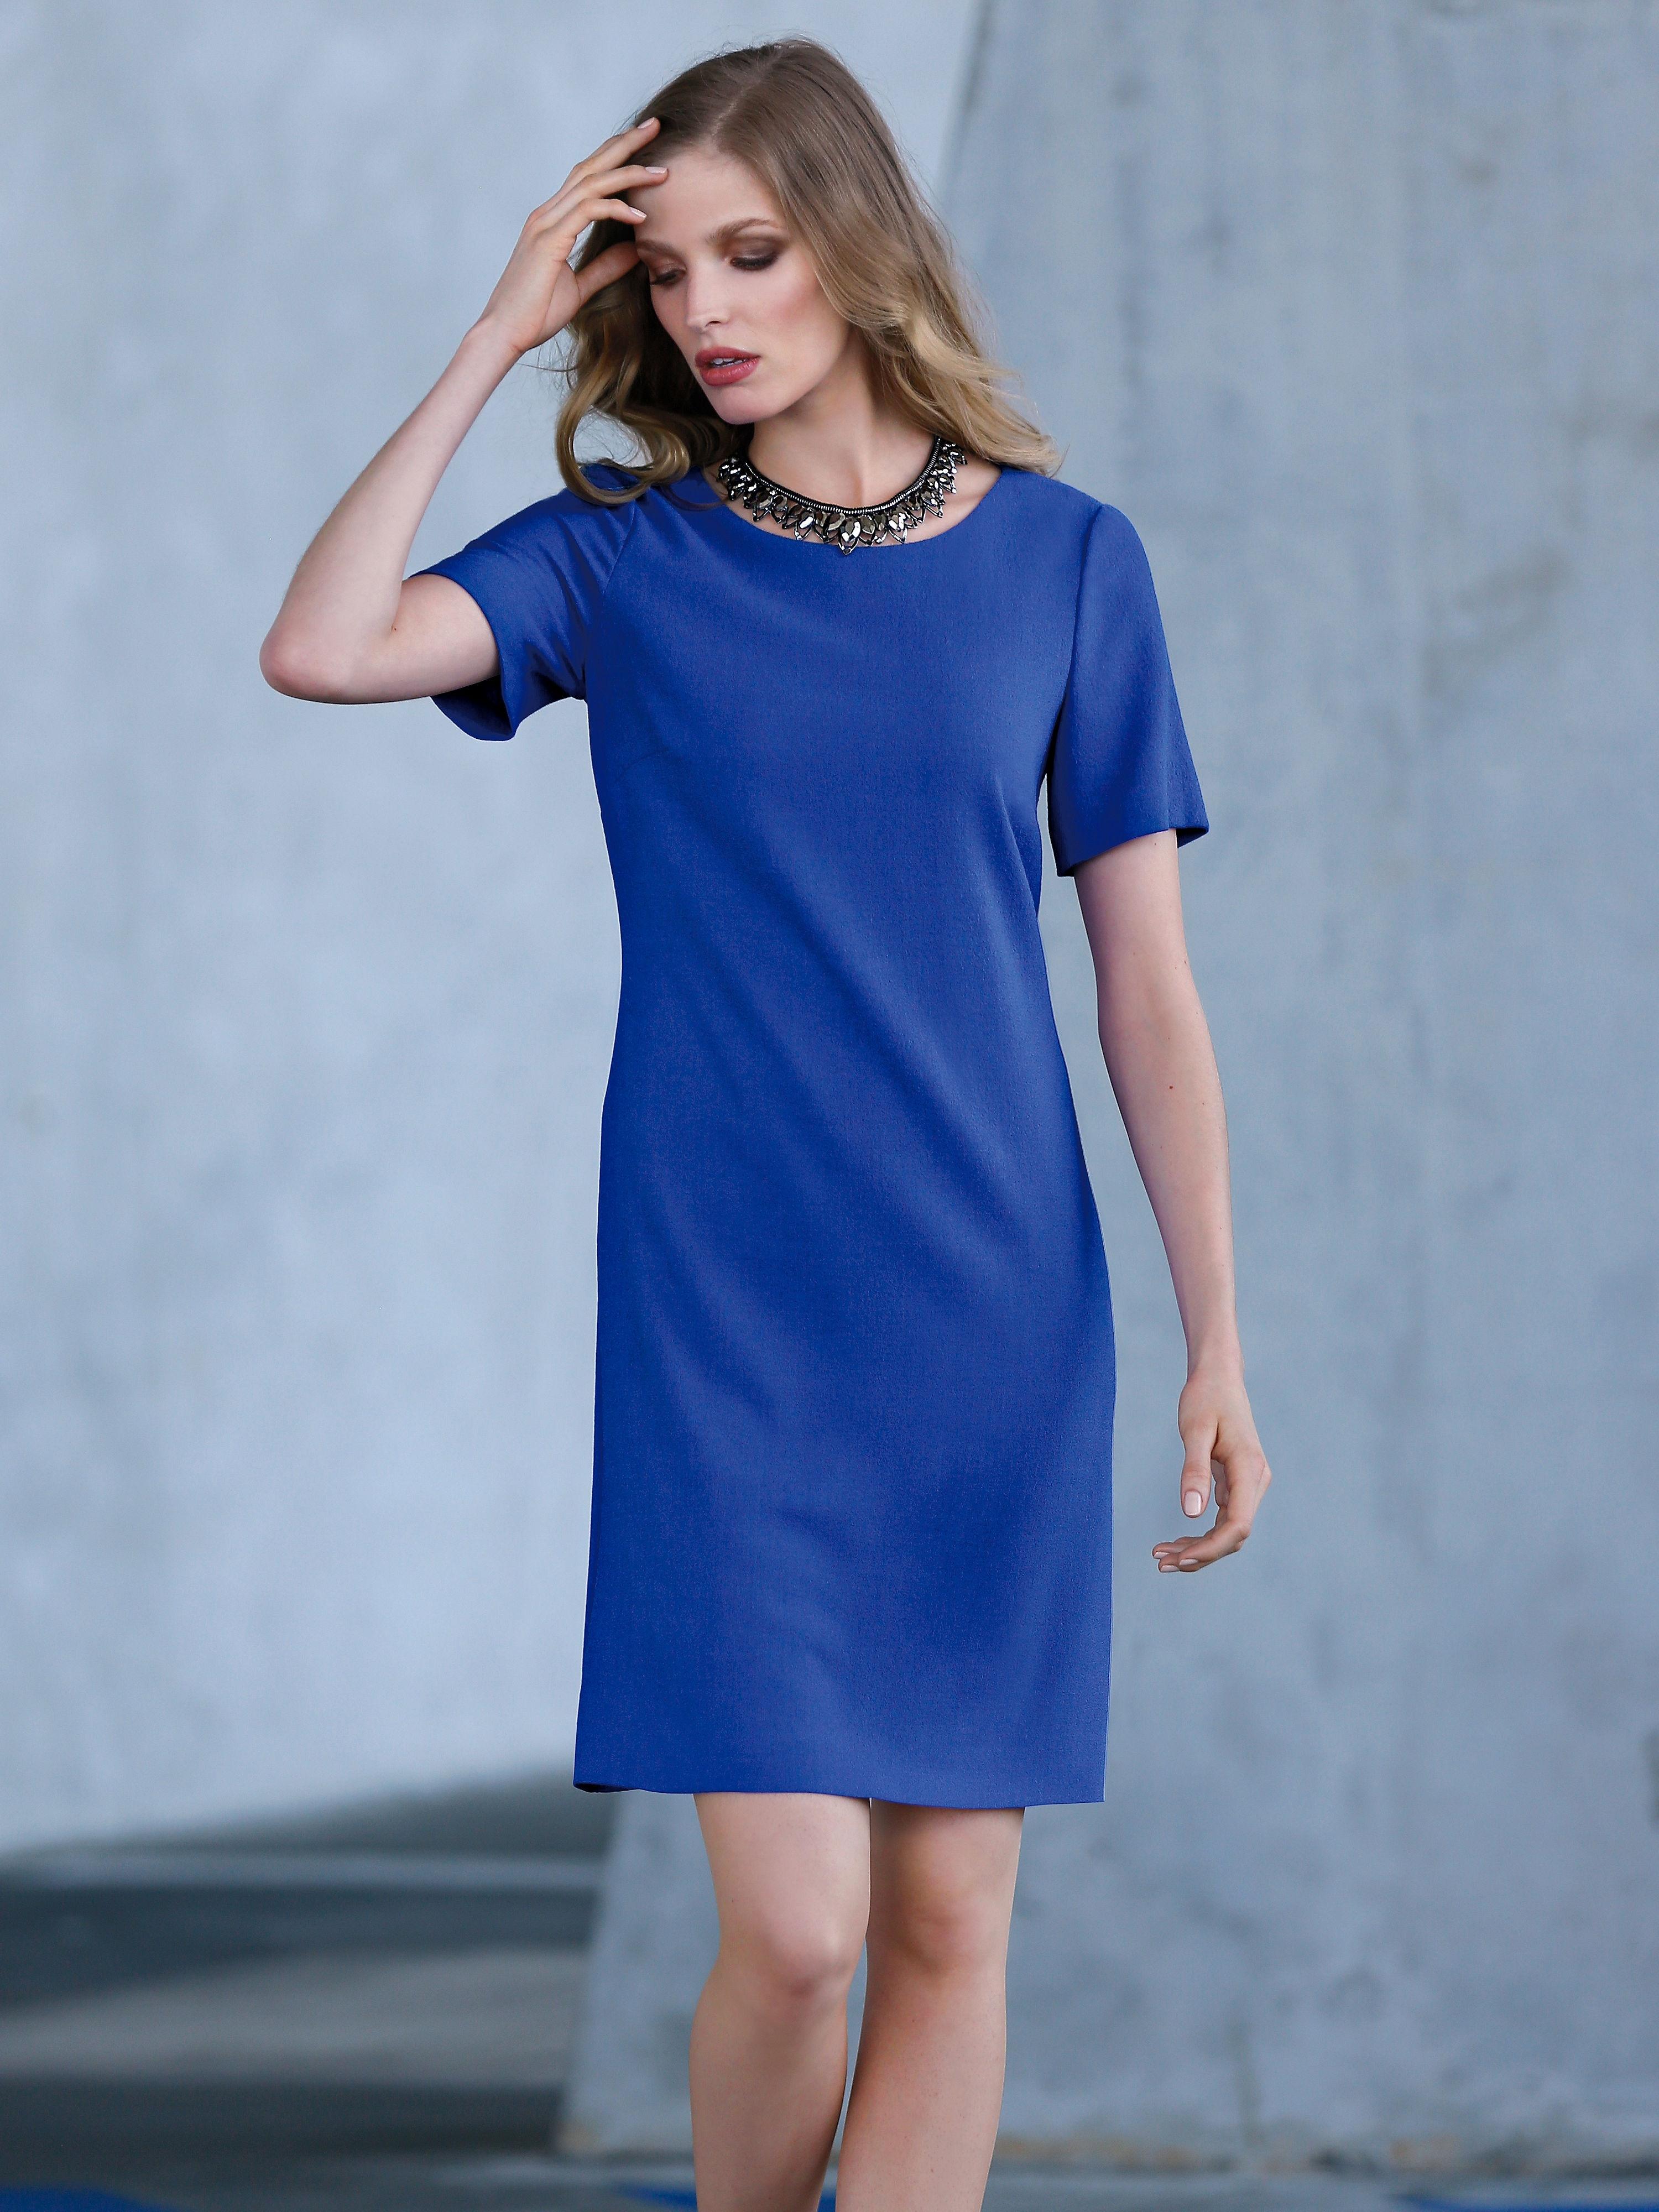 13 Spektakulär Kleid Royalblau Kurz Spezialgebiet13 Genial Kleid Royalblau Kurz für 2019